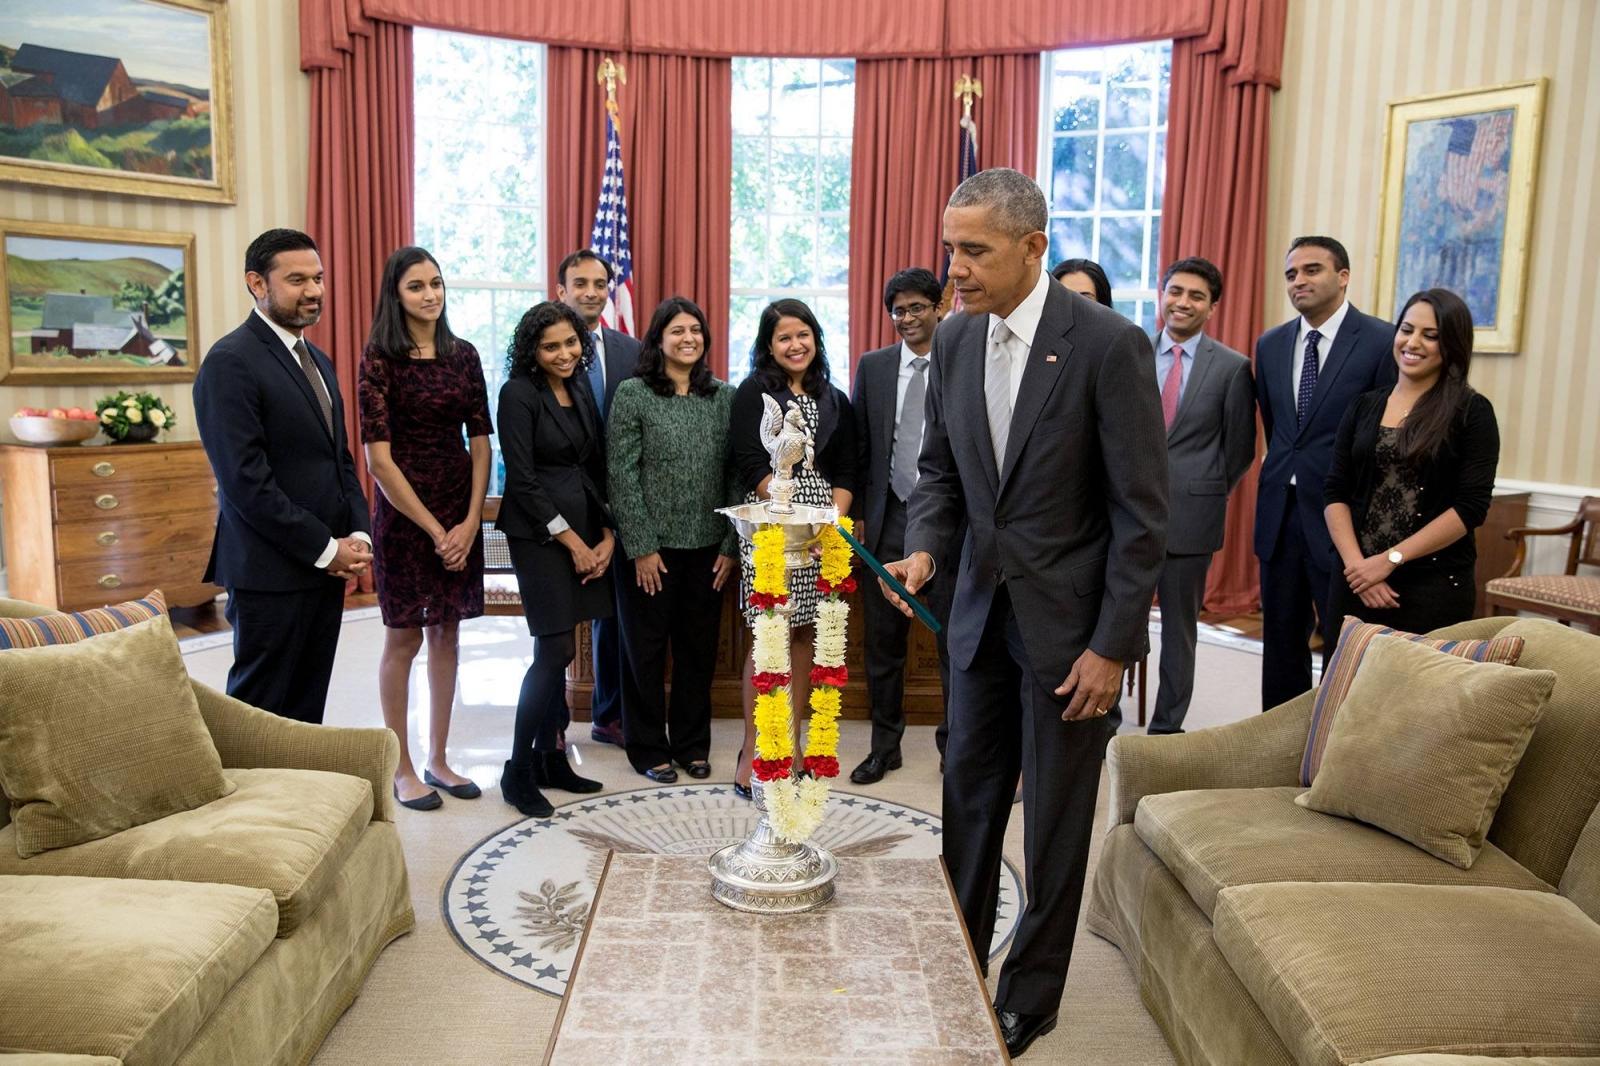 Barack Obama And Justin Trudeau Celebrate Diwali And Greet Indian Community